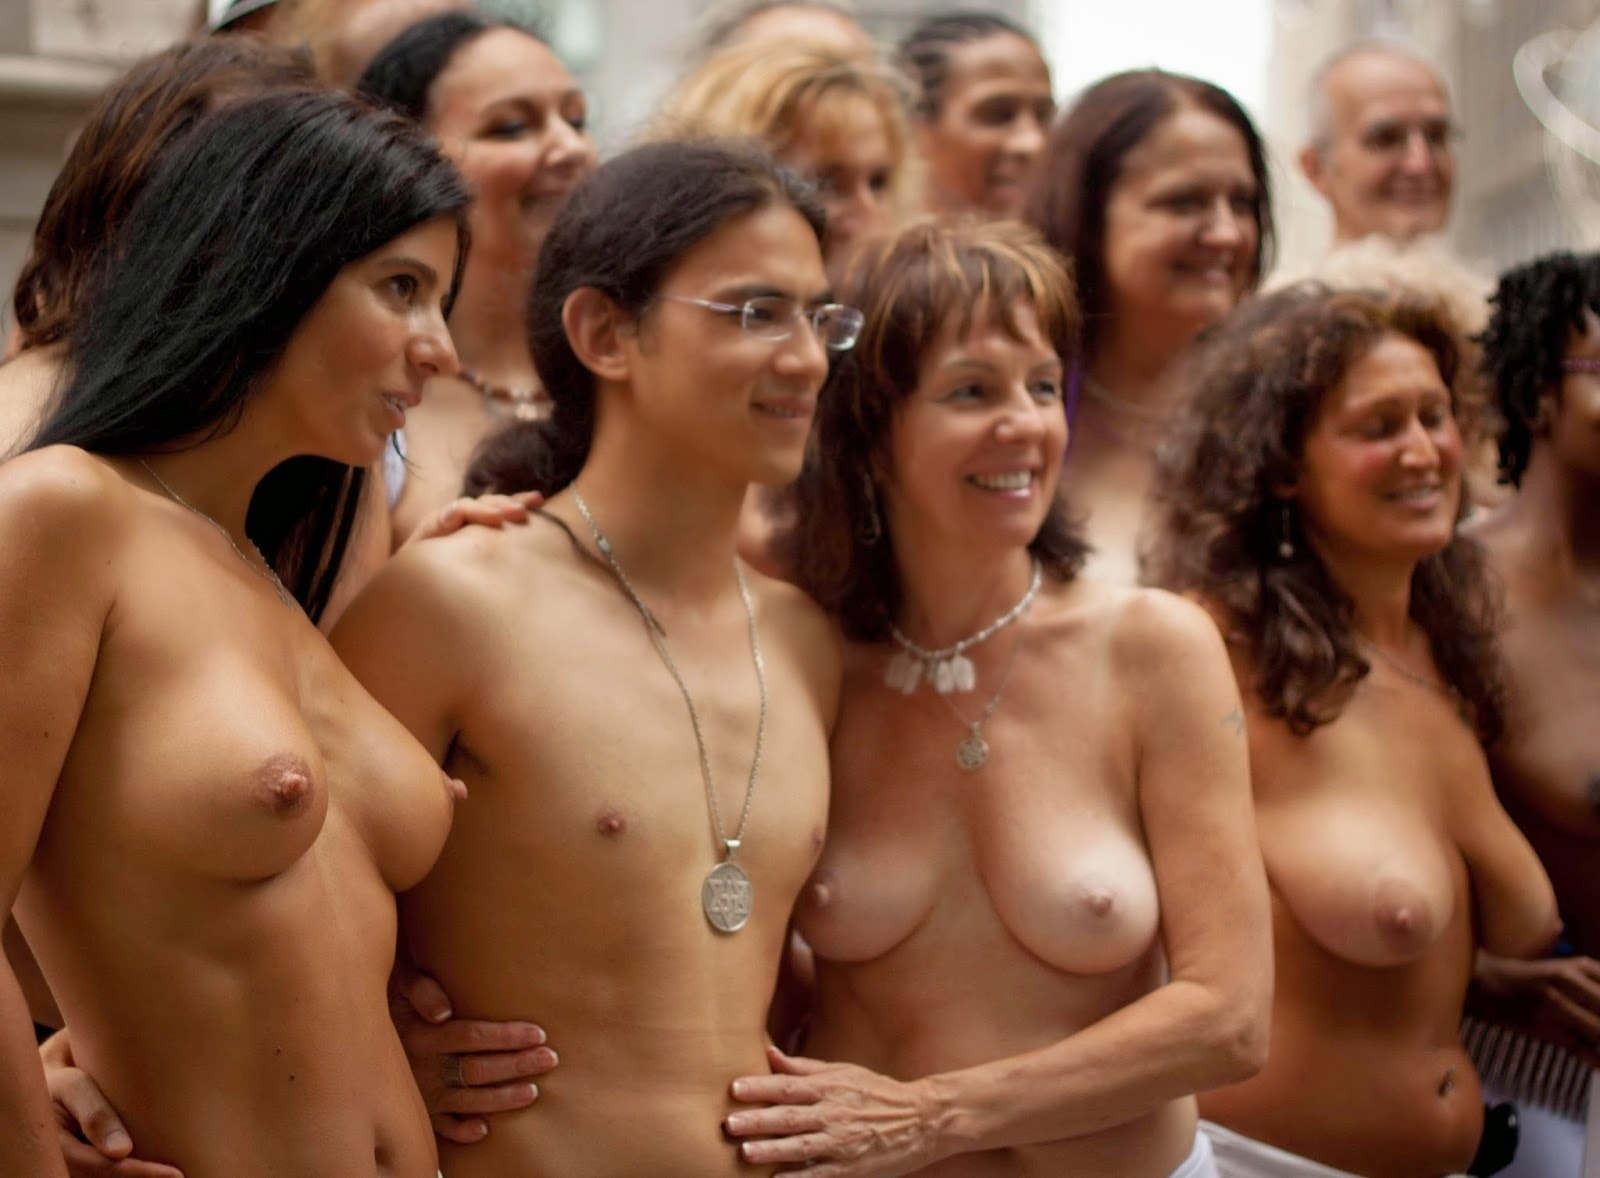 naked chicks at woodstock